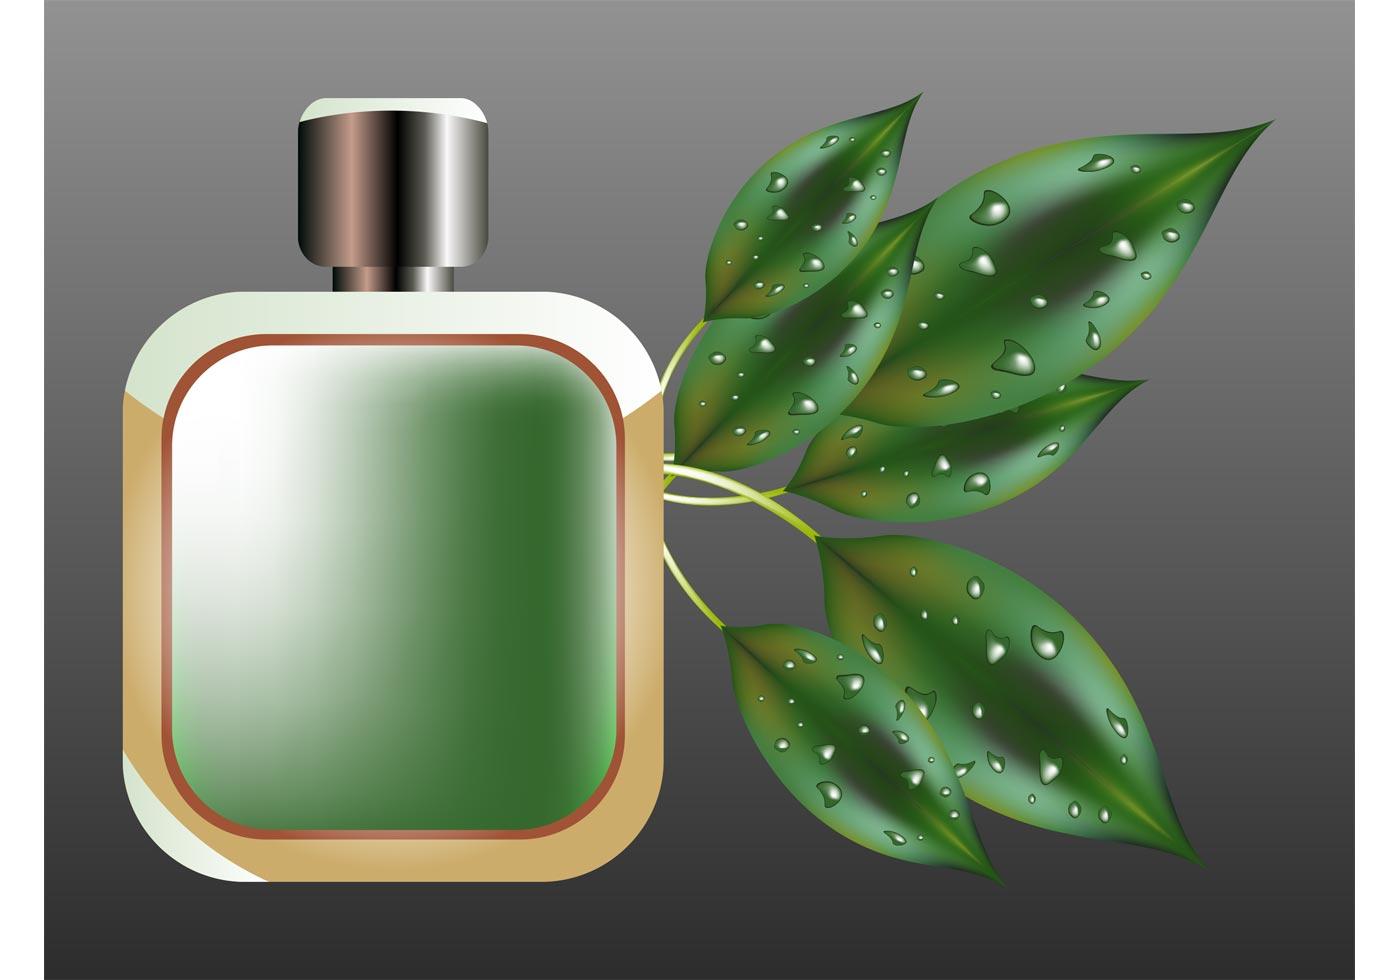 Perfume Bottle Vector 1340 Free Downloads